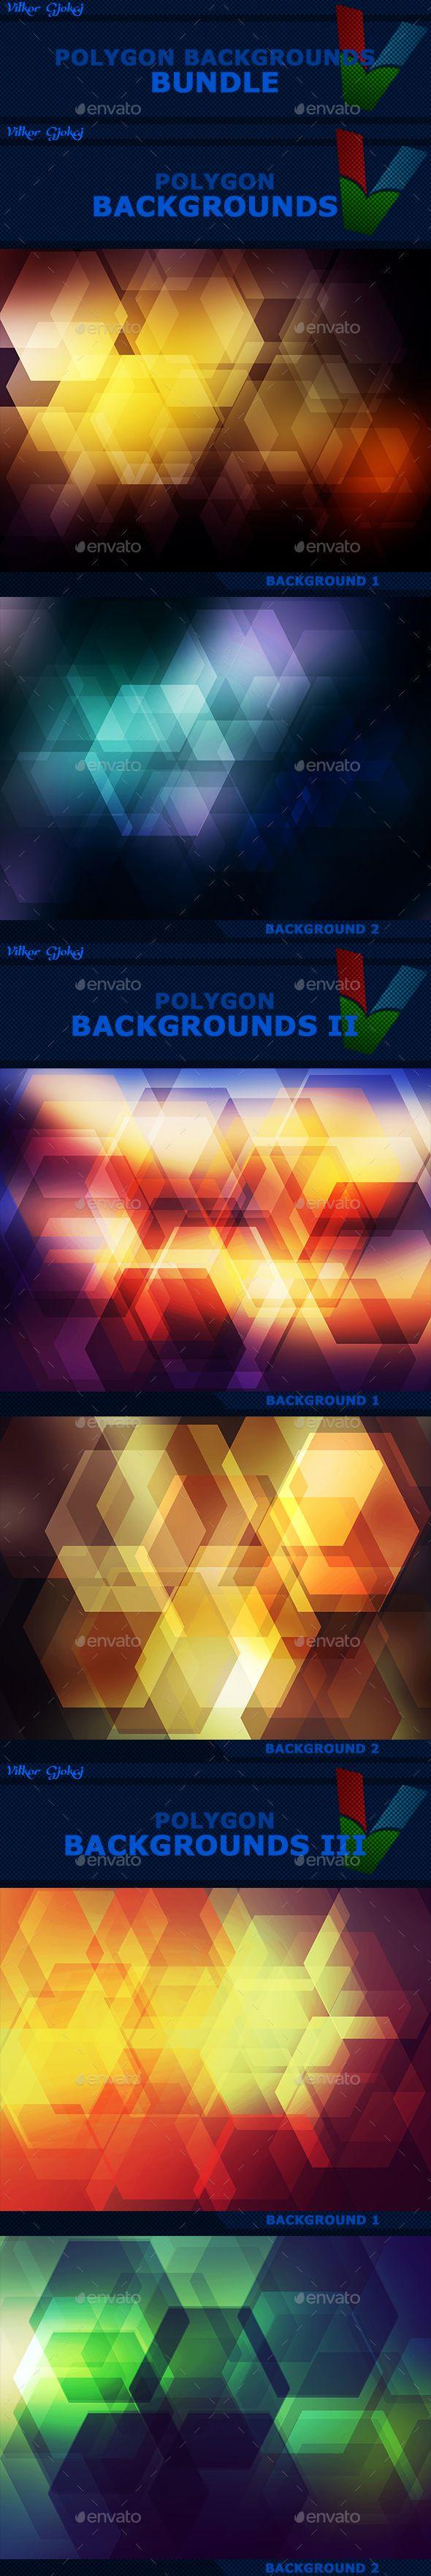 15 Polygon Backgrounds BUNDLE